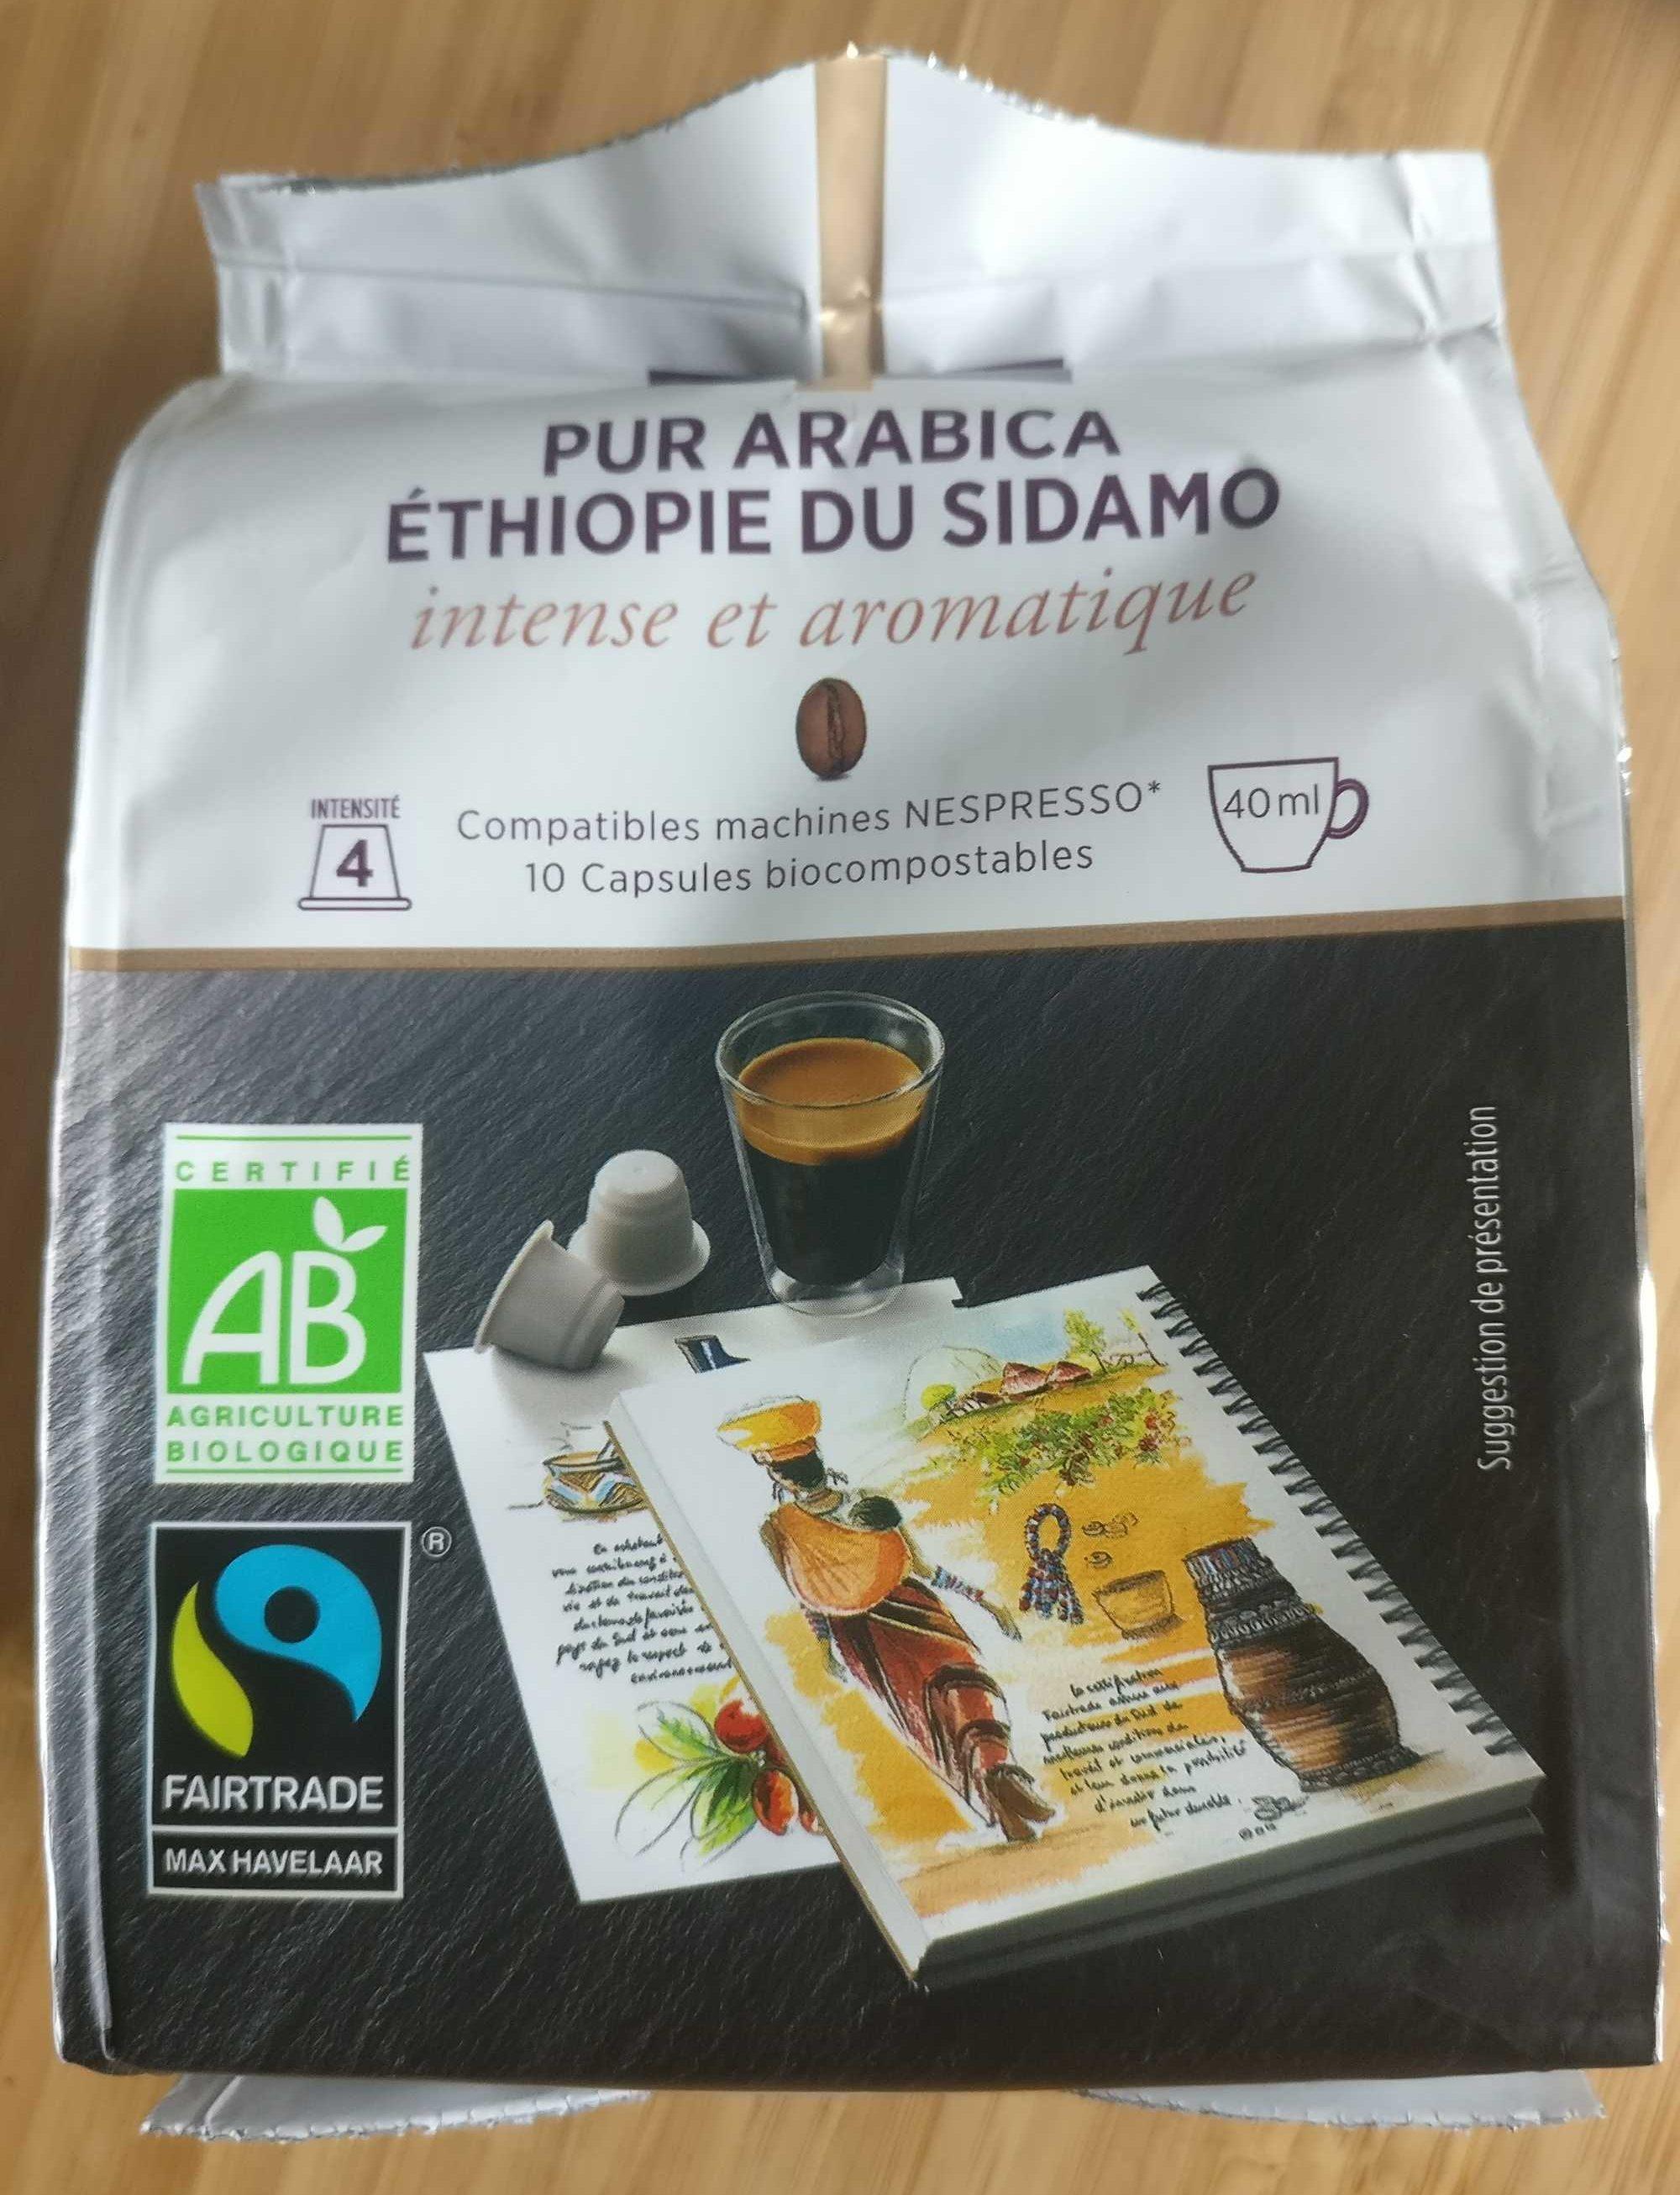 Capsules de café pur arabica Ethiopie du Sidamo bio - Product - fr